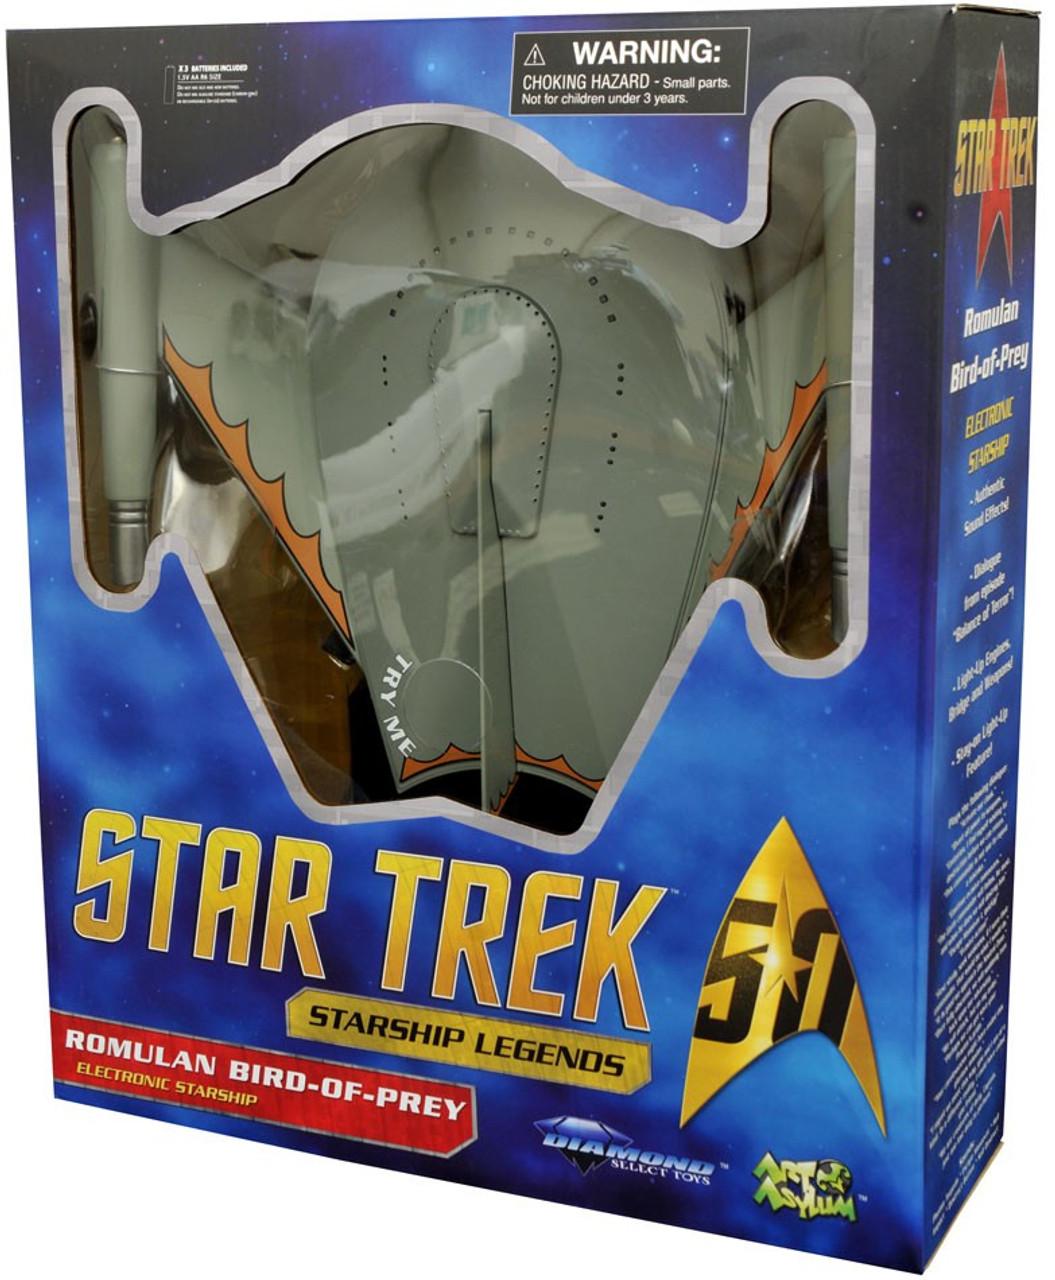 Star Trek Romulan Bird of Prey Electronic Starship